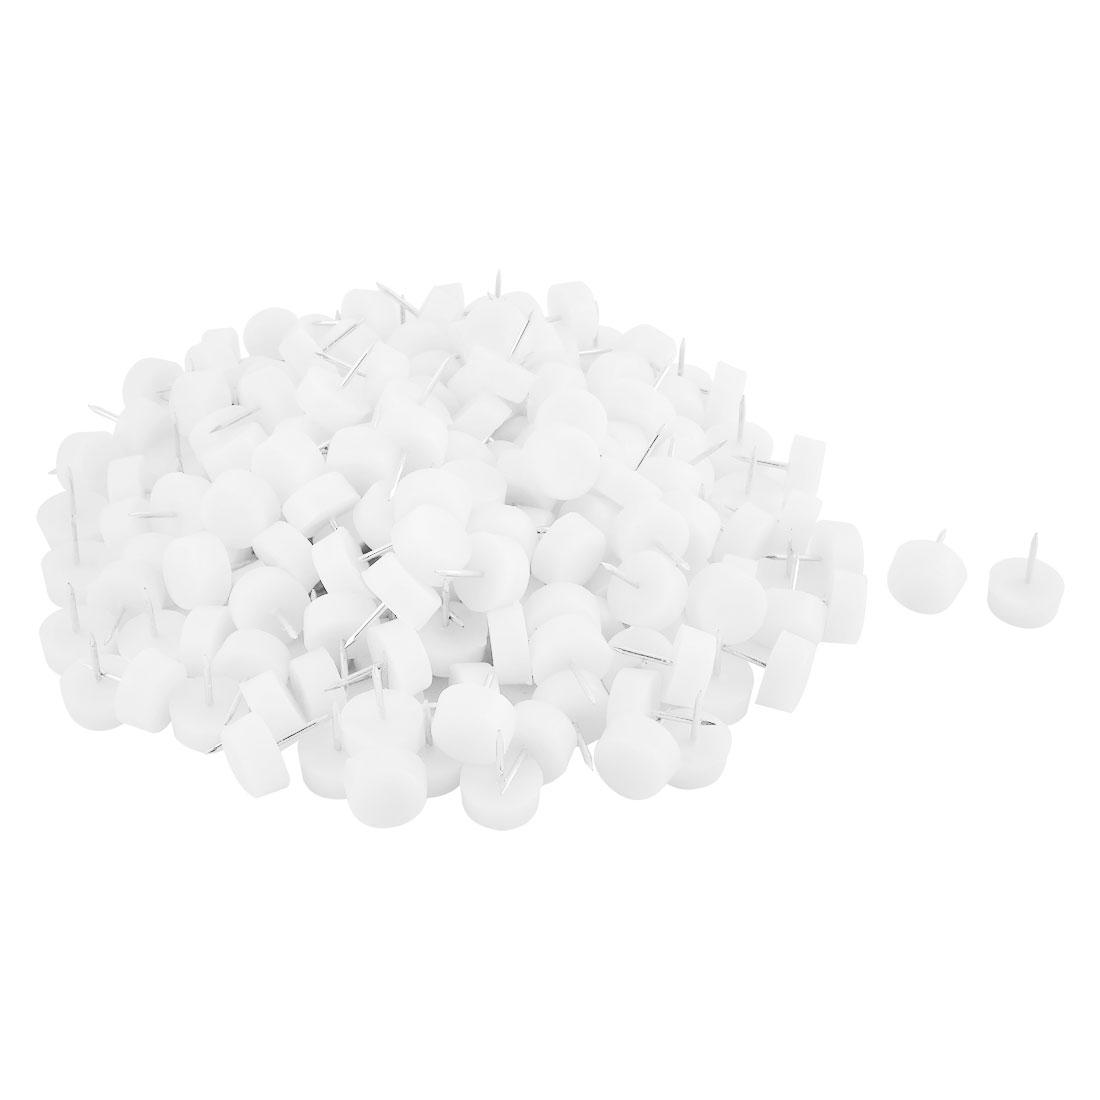 Household Plastic Anti Scratch Chair Table Furniture Legs Glide Nail White 10 x 21mm 200pcs